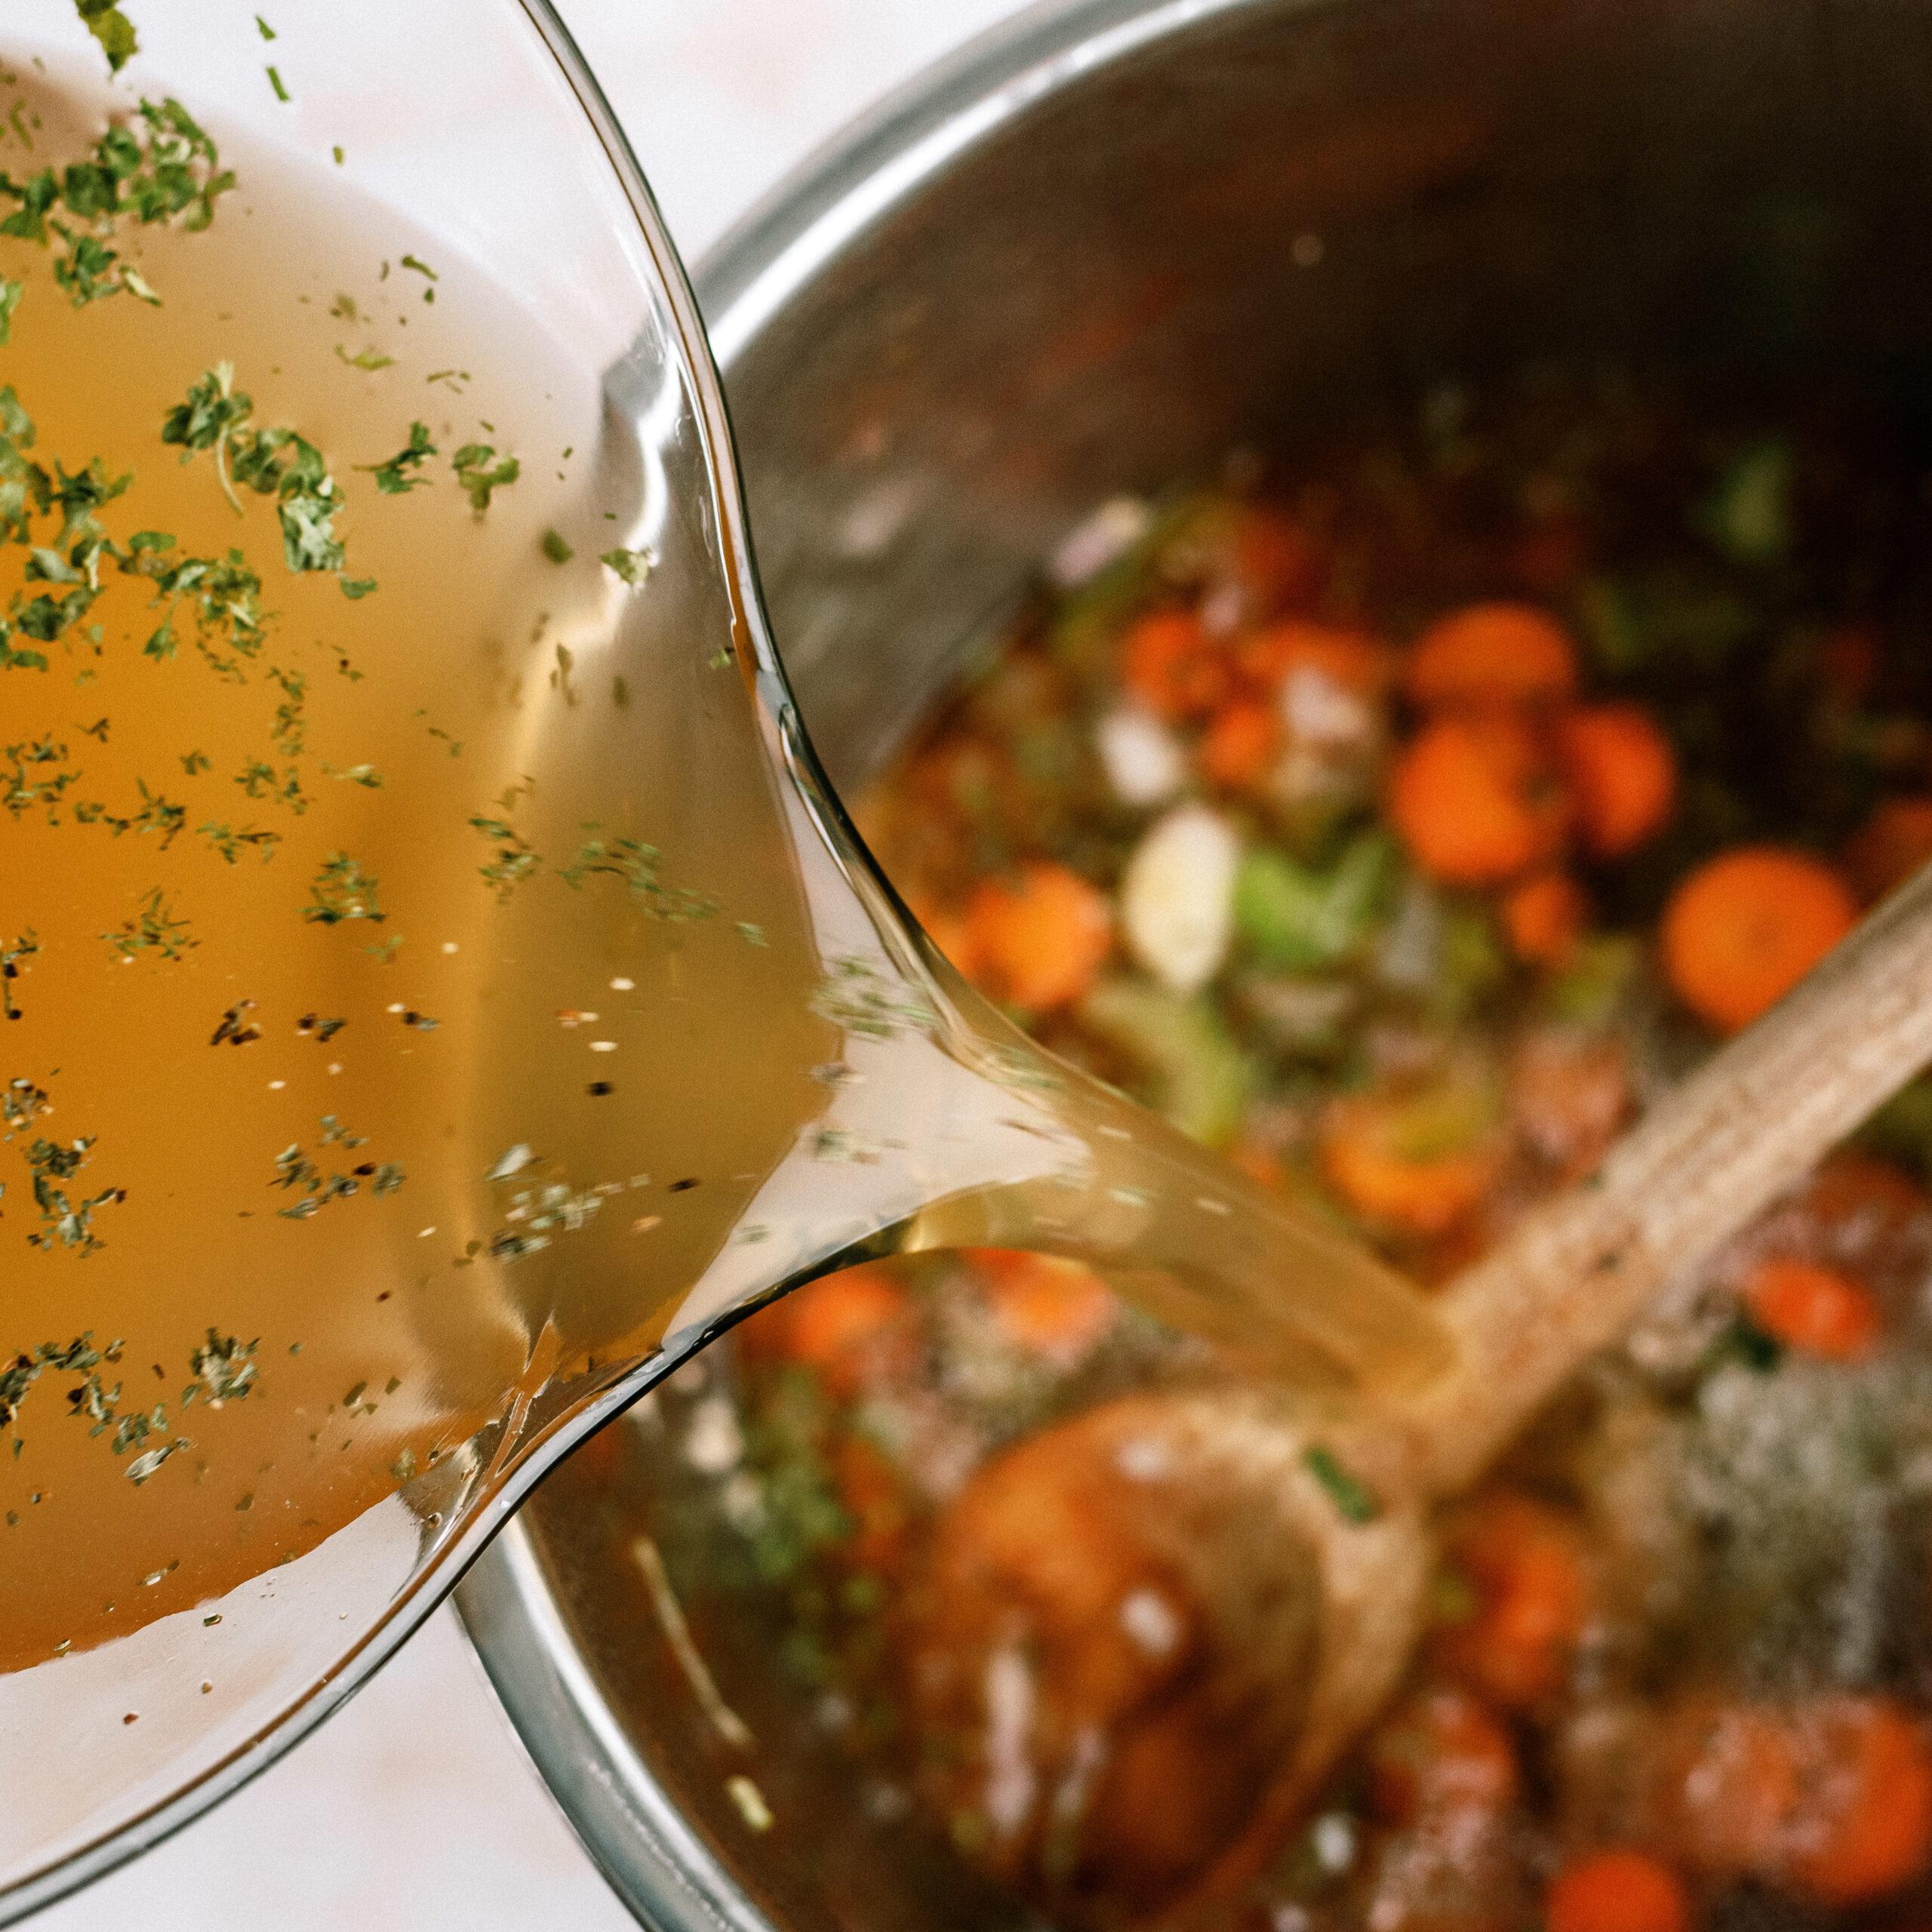 Broth added to Italian Wedding Soup